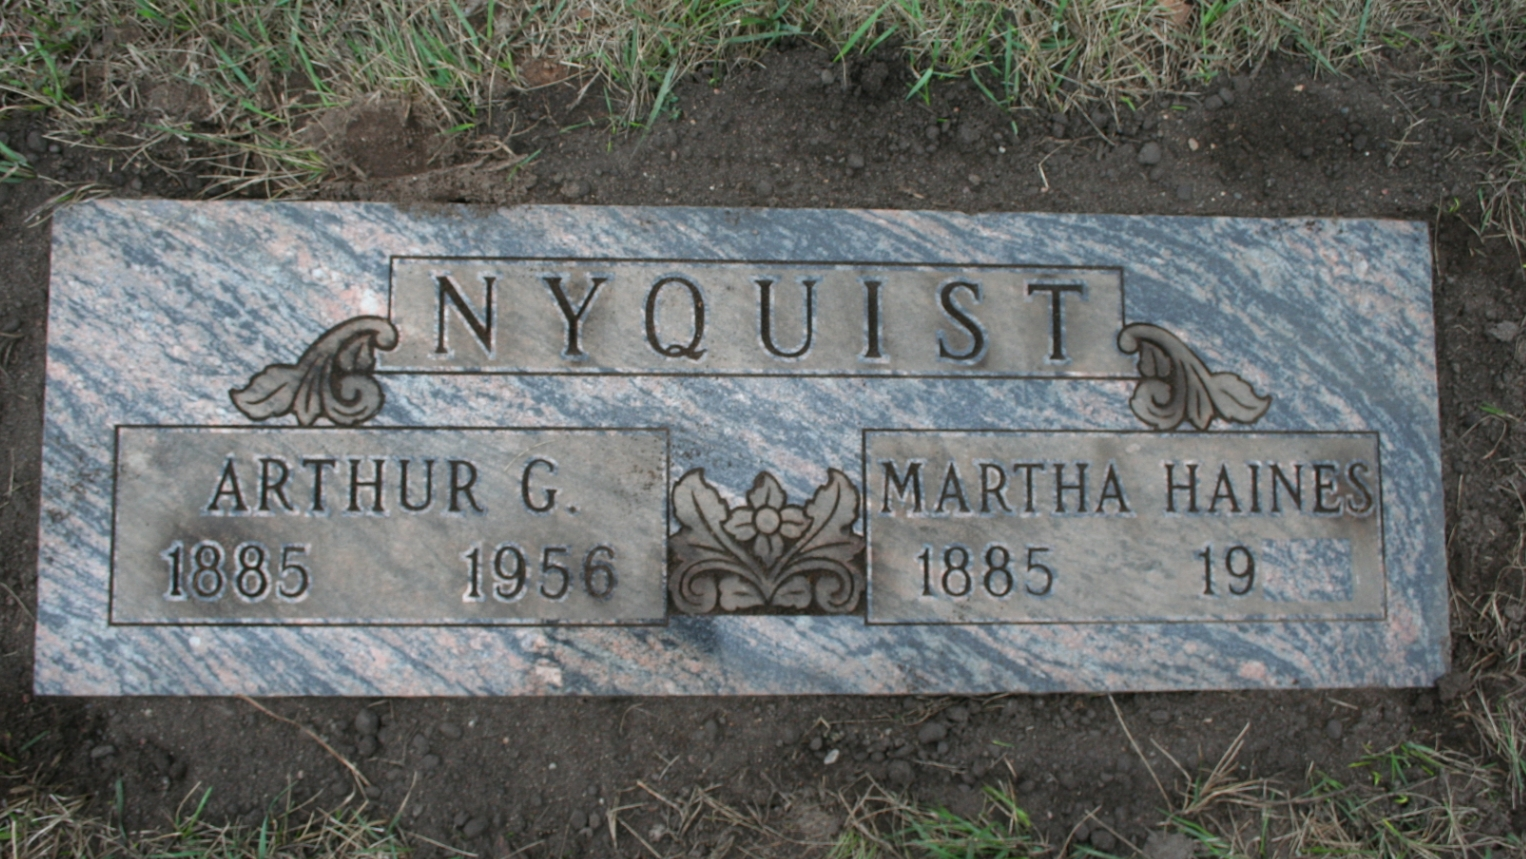 Arthur Wilford Nyquist